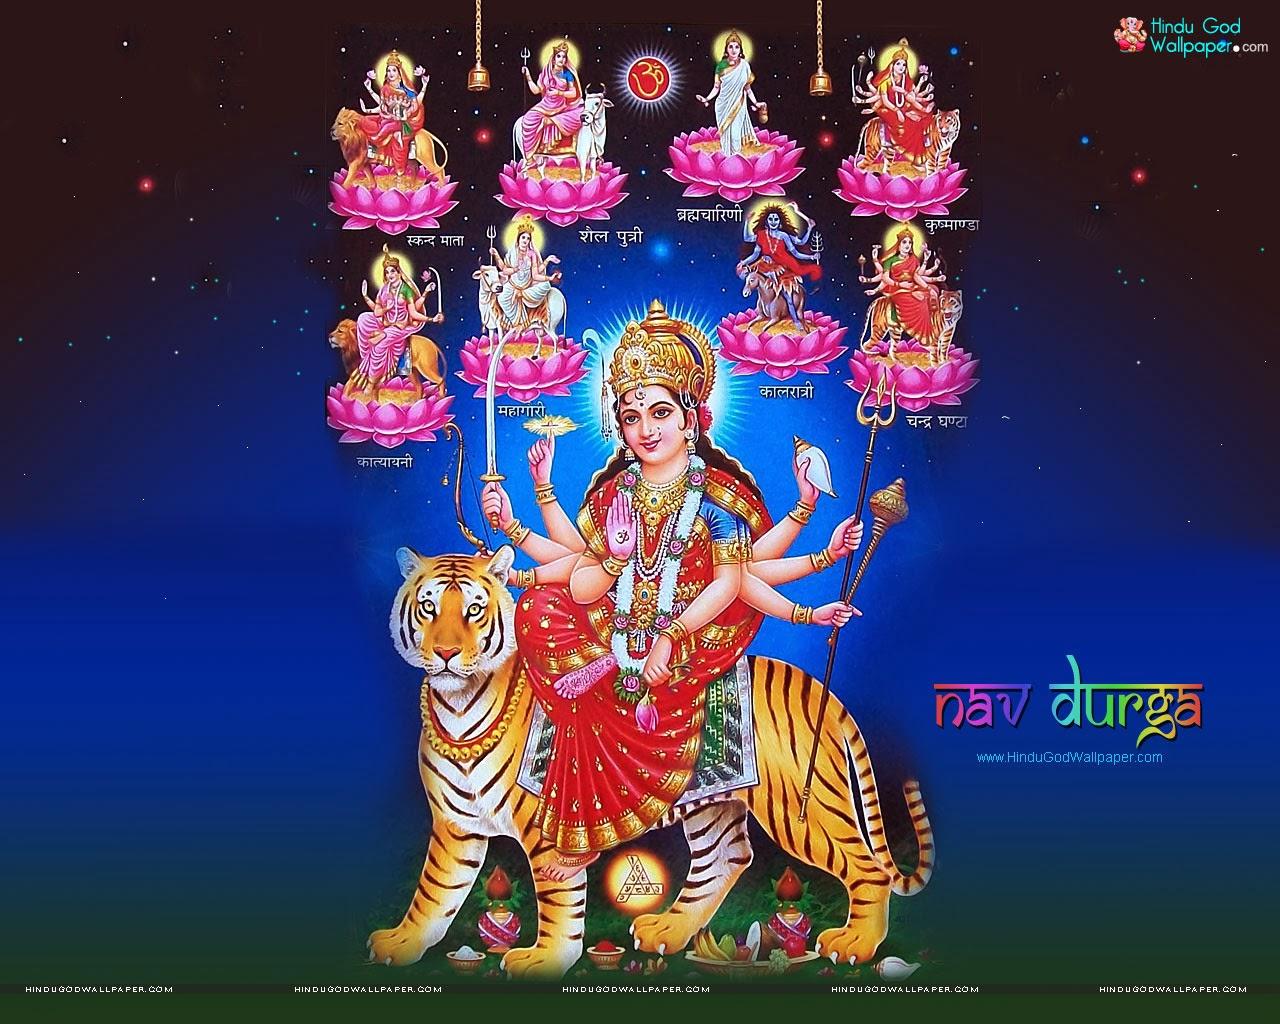 jai shri krishna hd image download